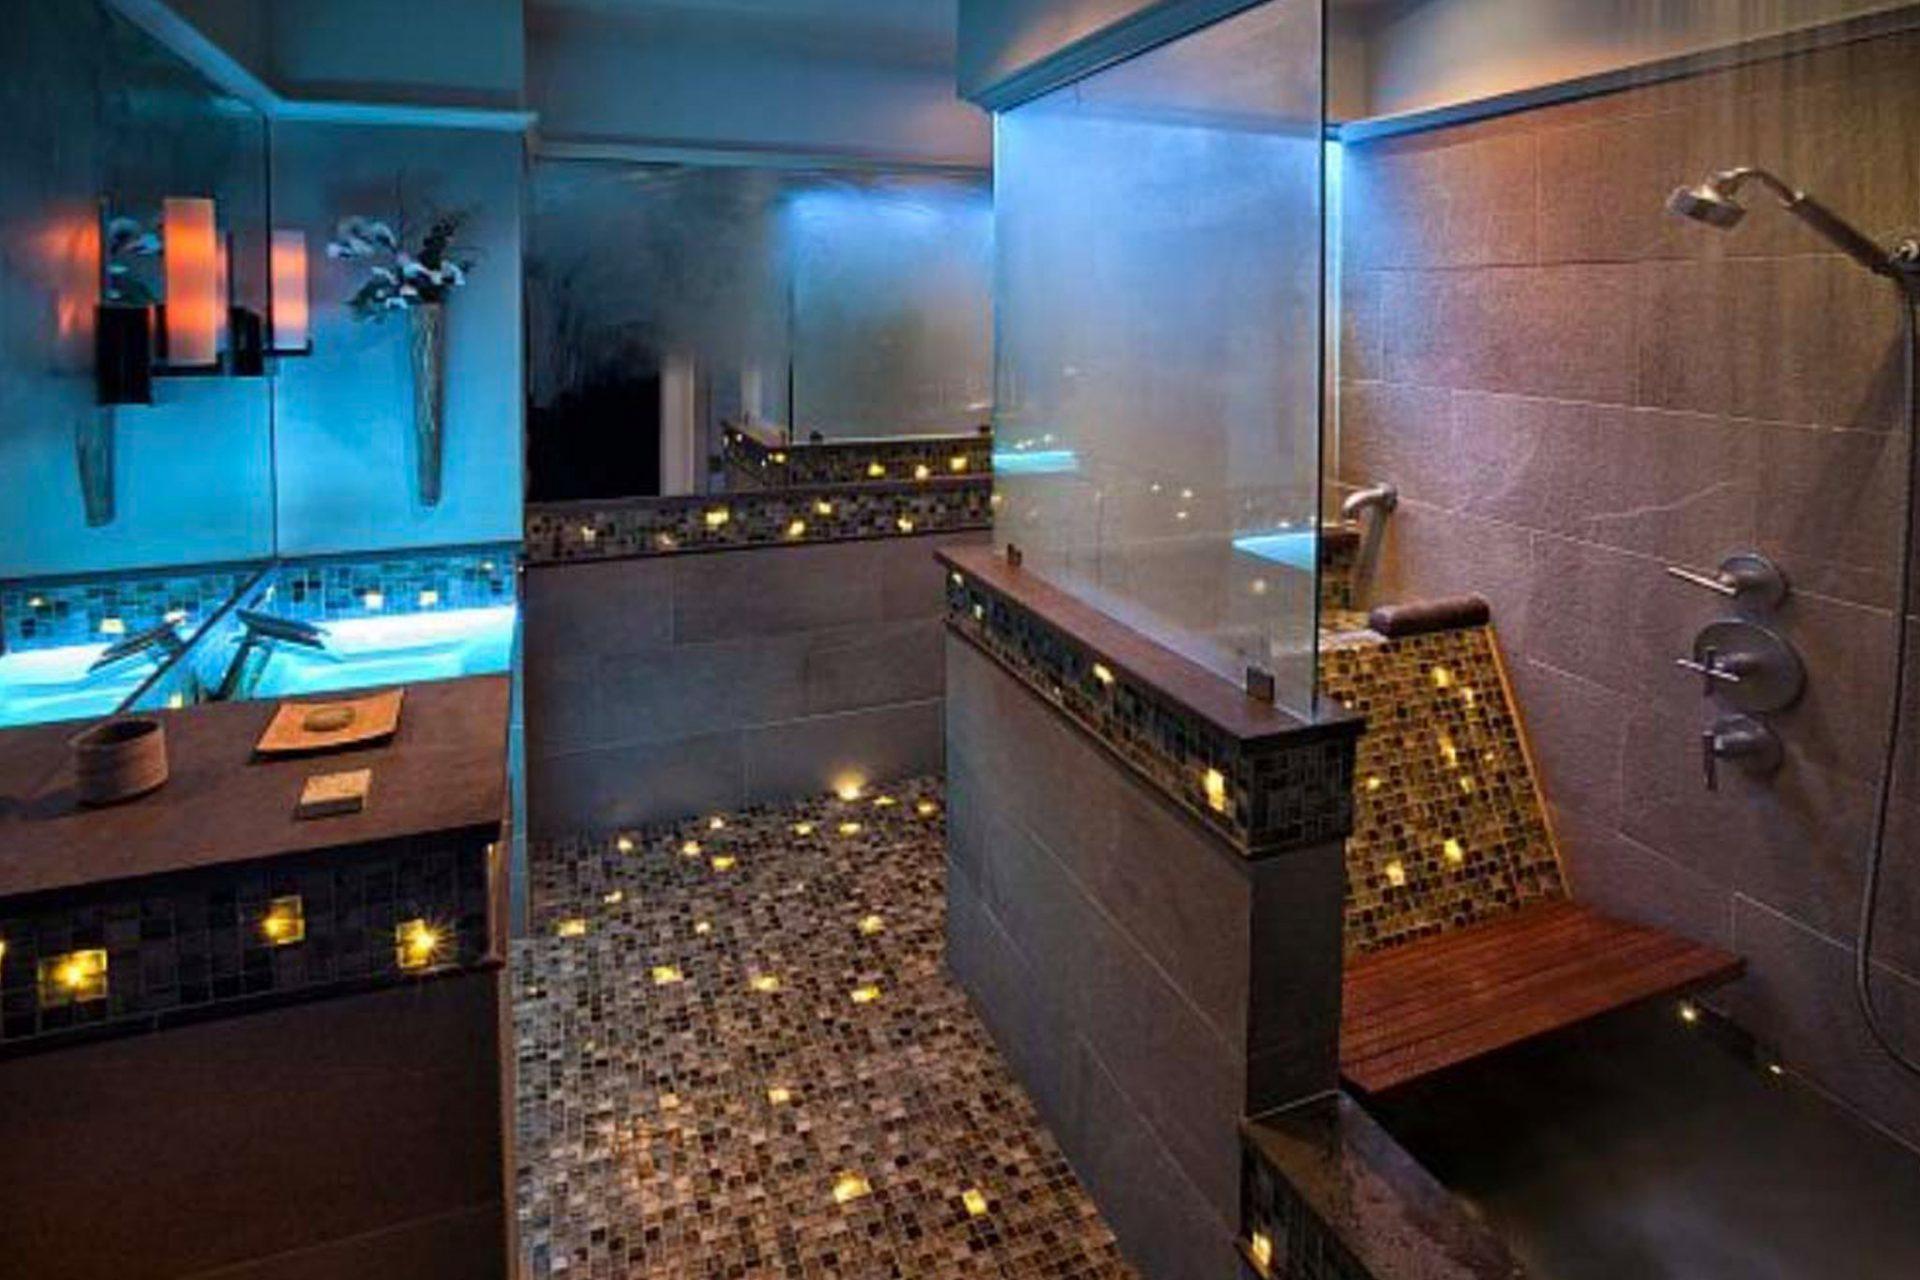 A luxurious bath with colorful fiber optic lighting, blue-lit glass sink, a roman bath and a rain head shower.